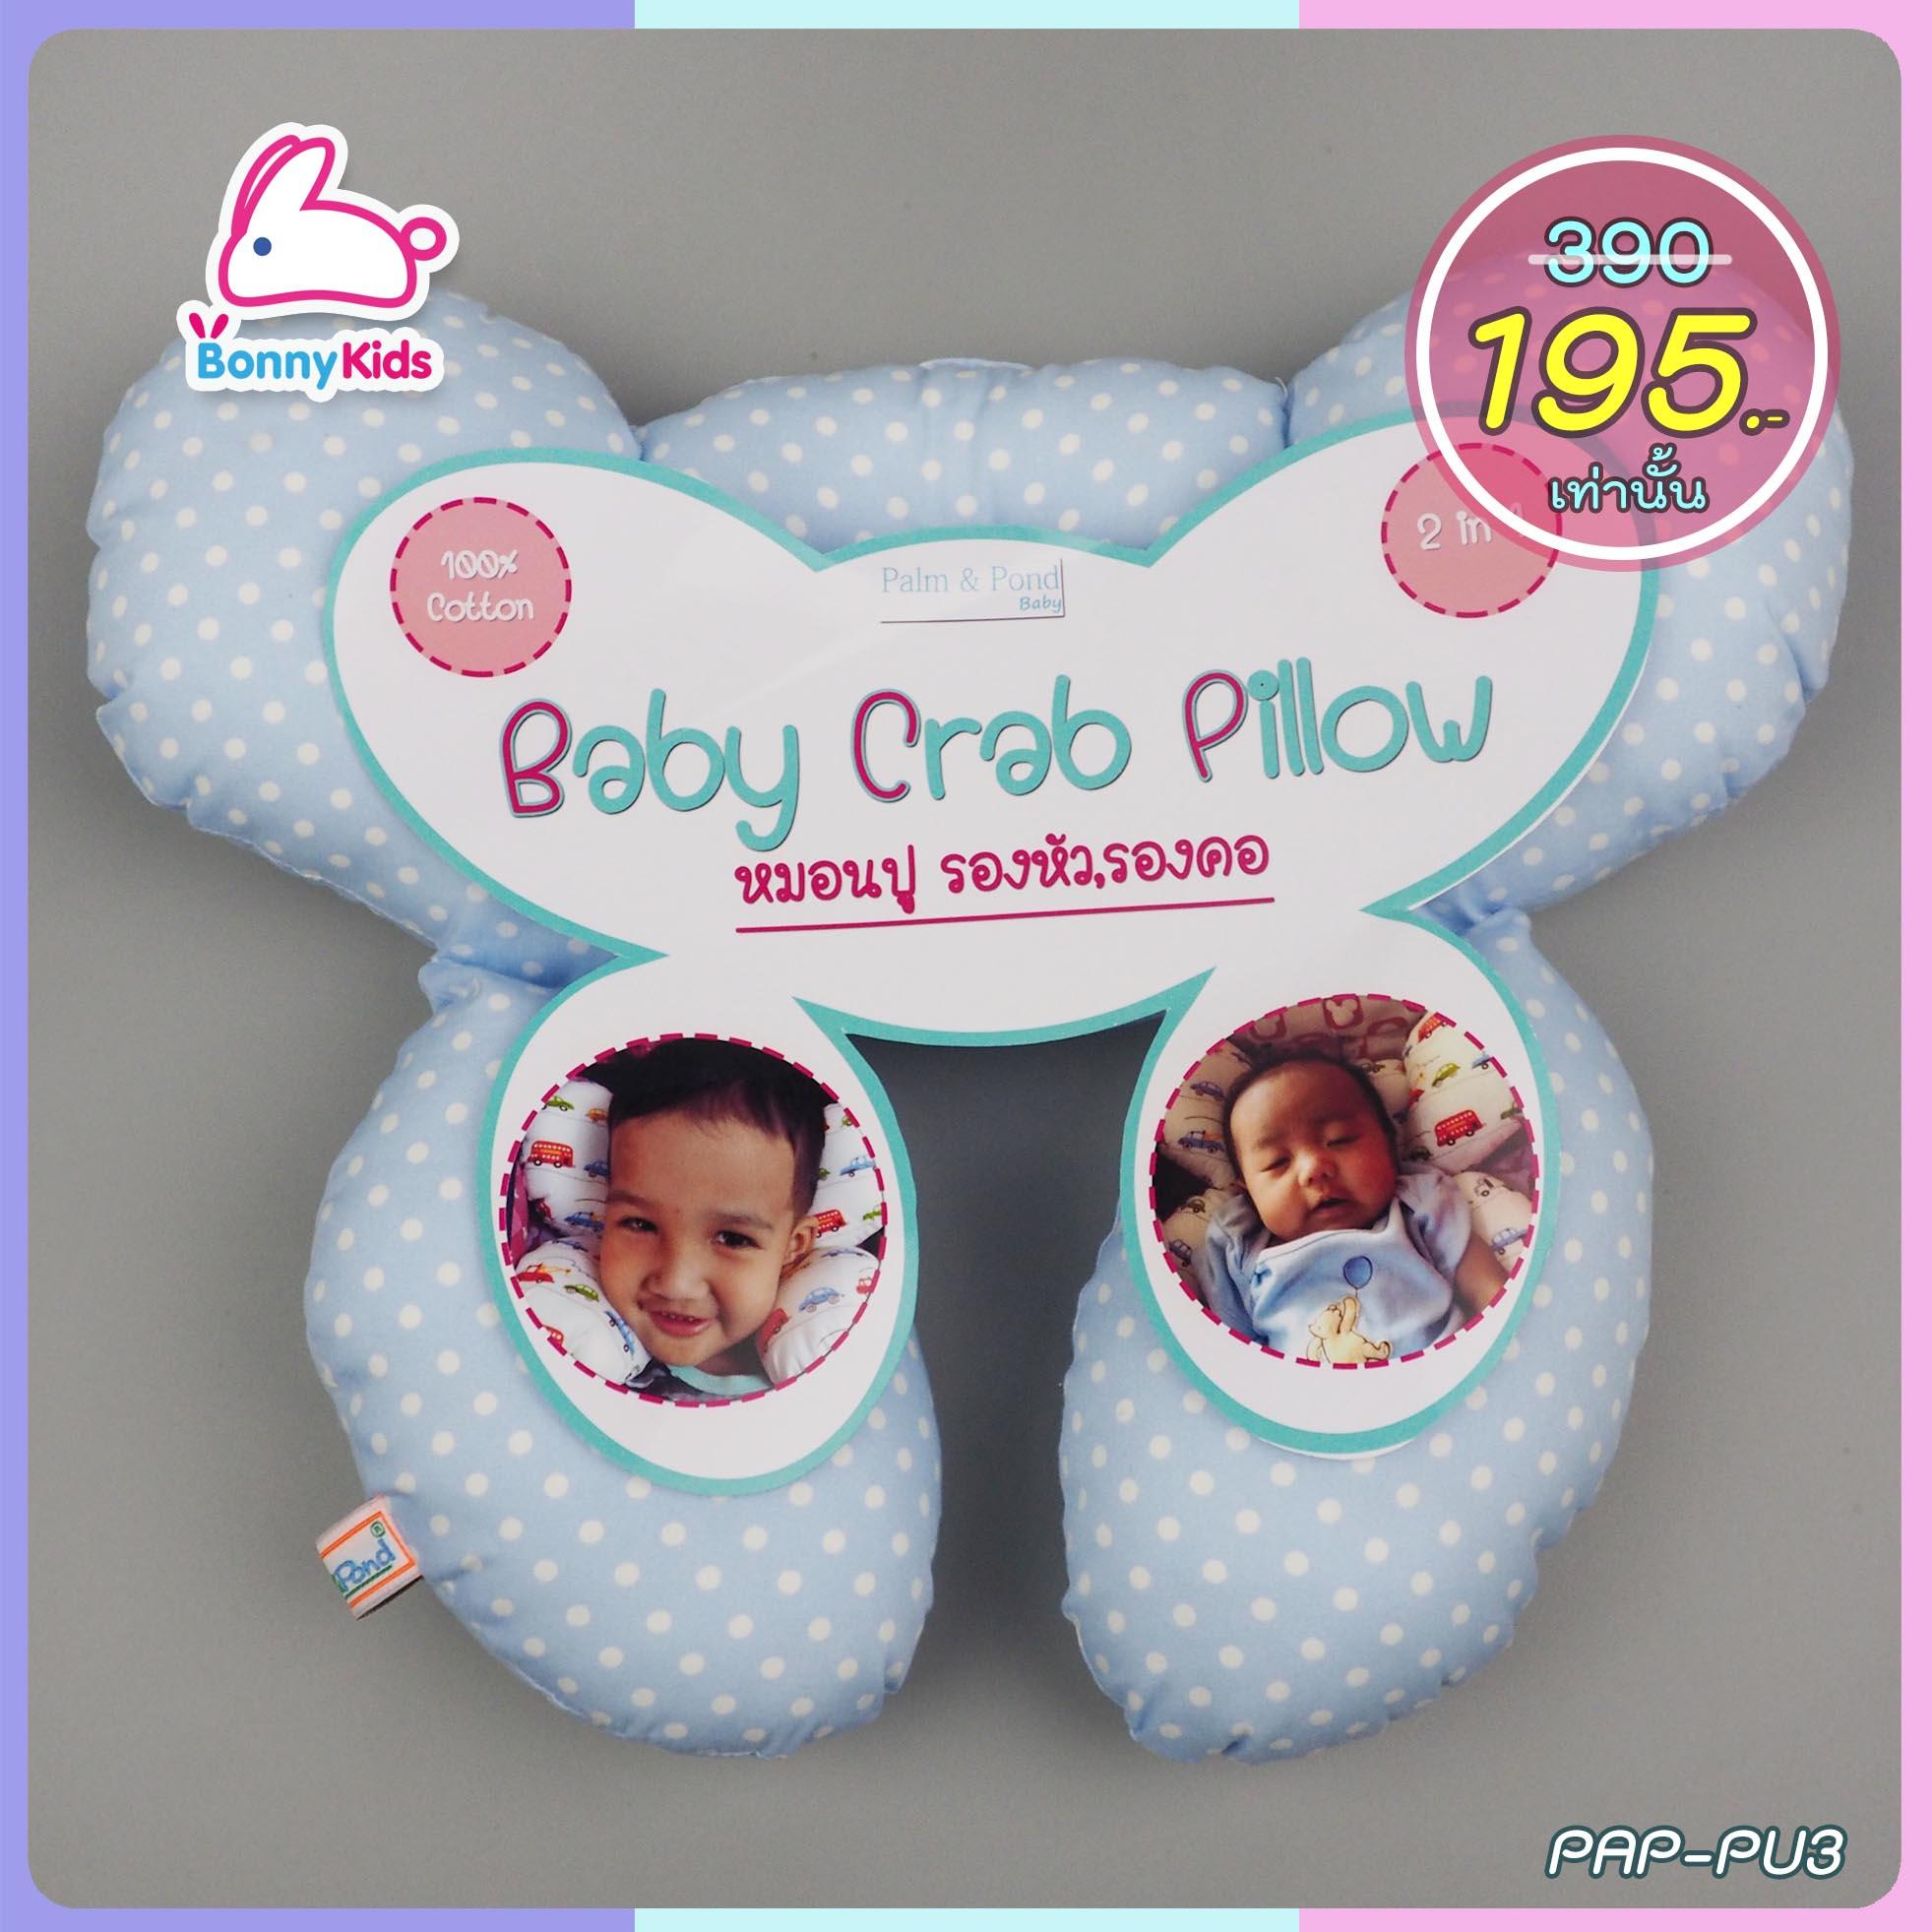 Baby Crab Pillow หมอนปู รองหัวรองคอเด็ก 2 In 1